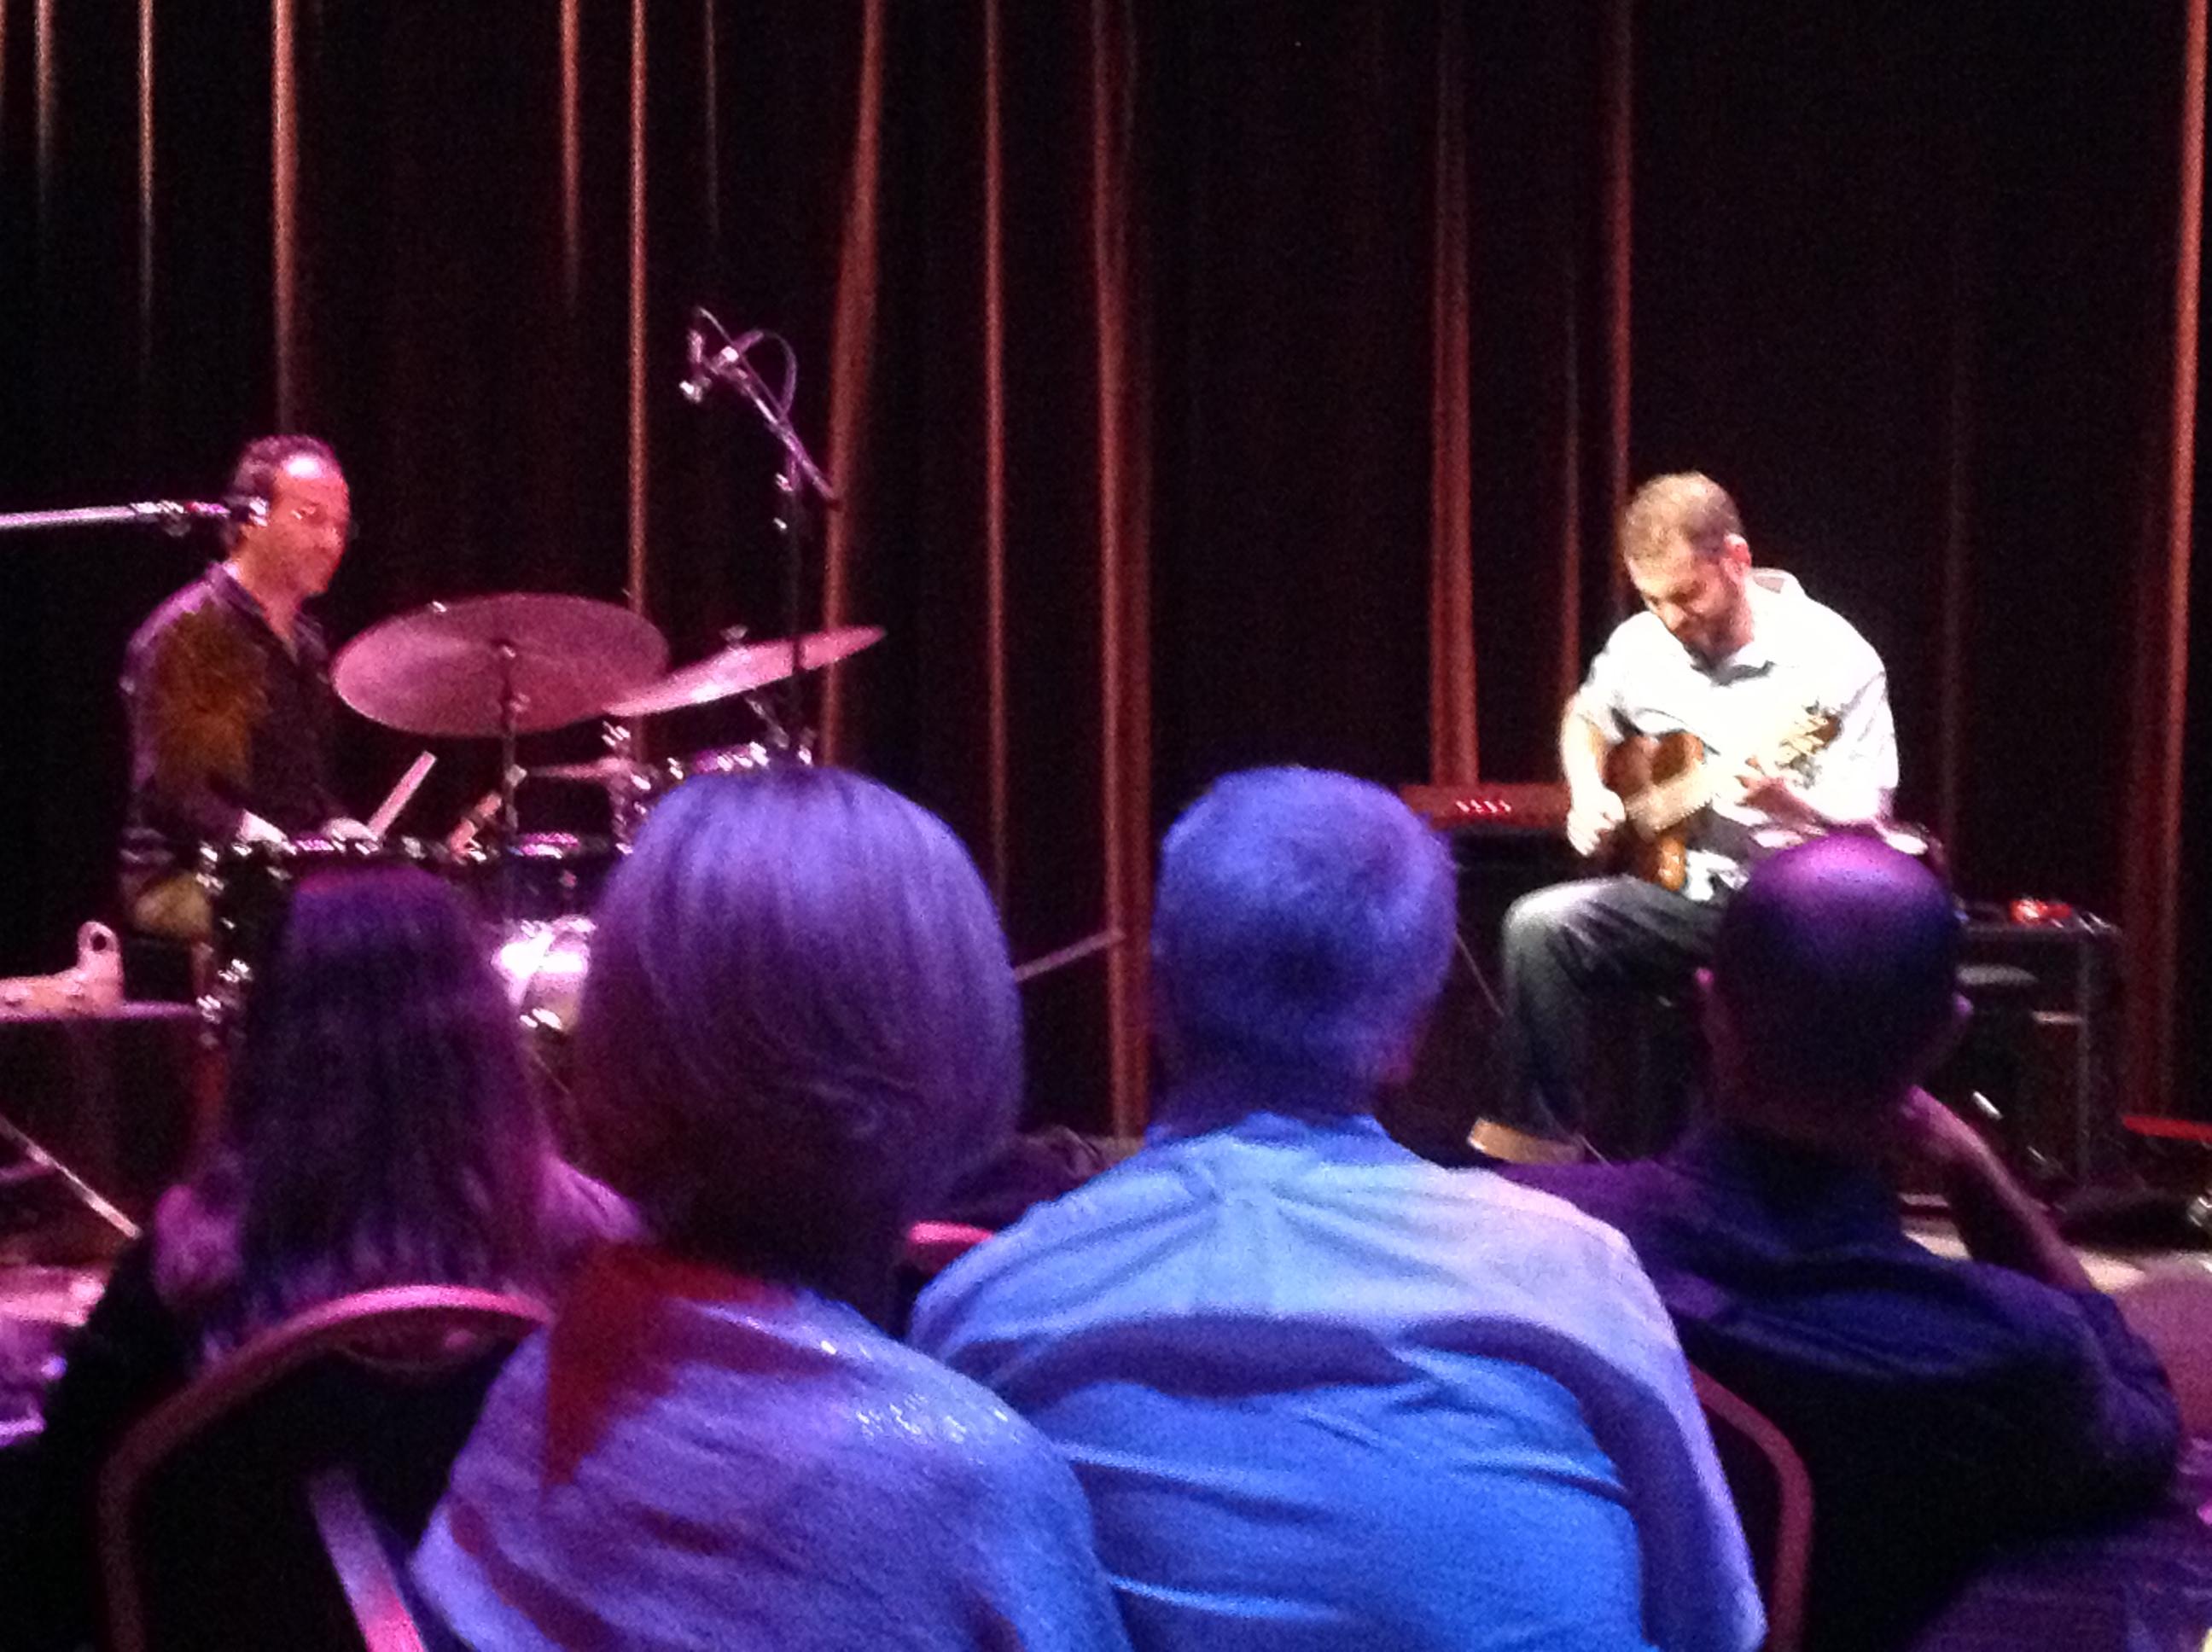 Charlie Hunter & Scott Amendola at the Bienes Center for the Arts